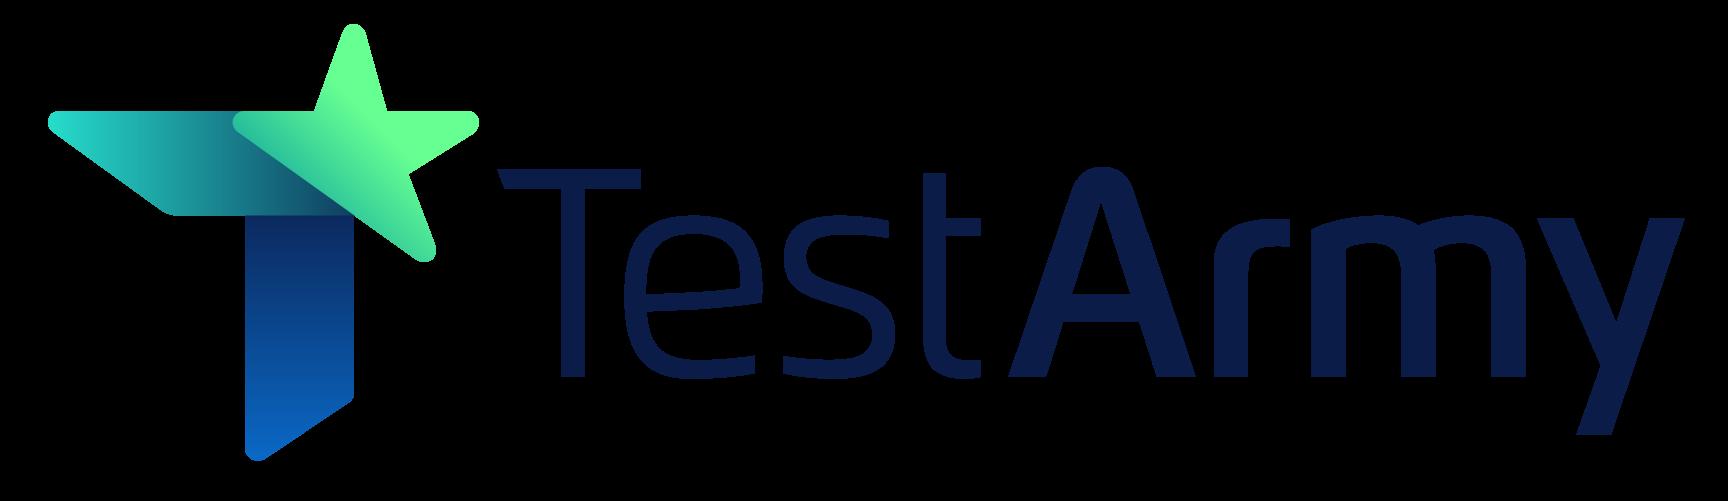 Testarmy logo rgb 01 big